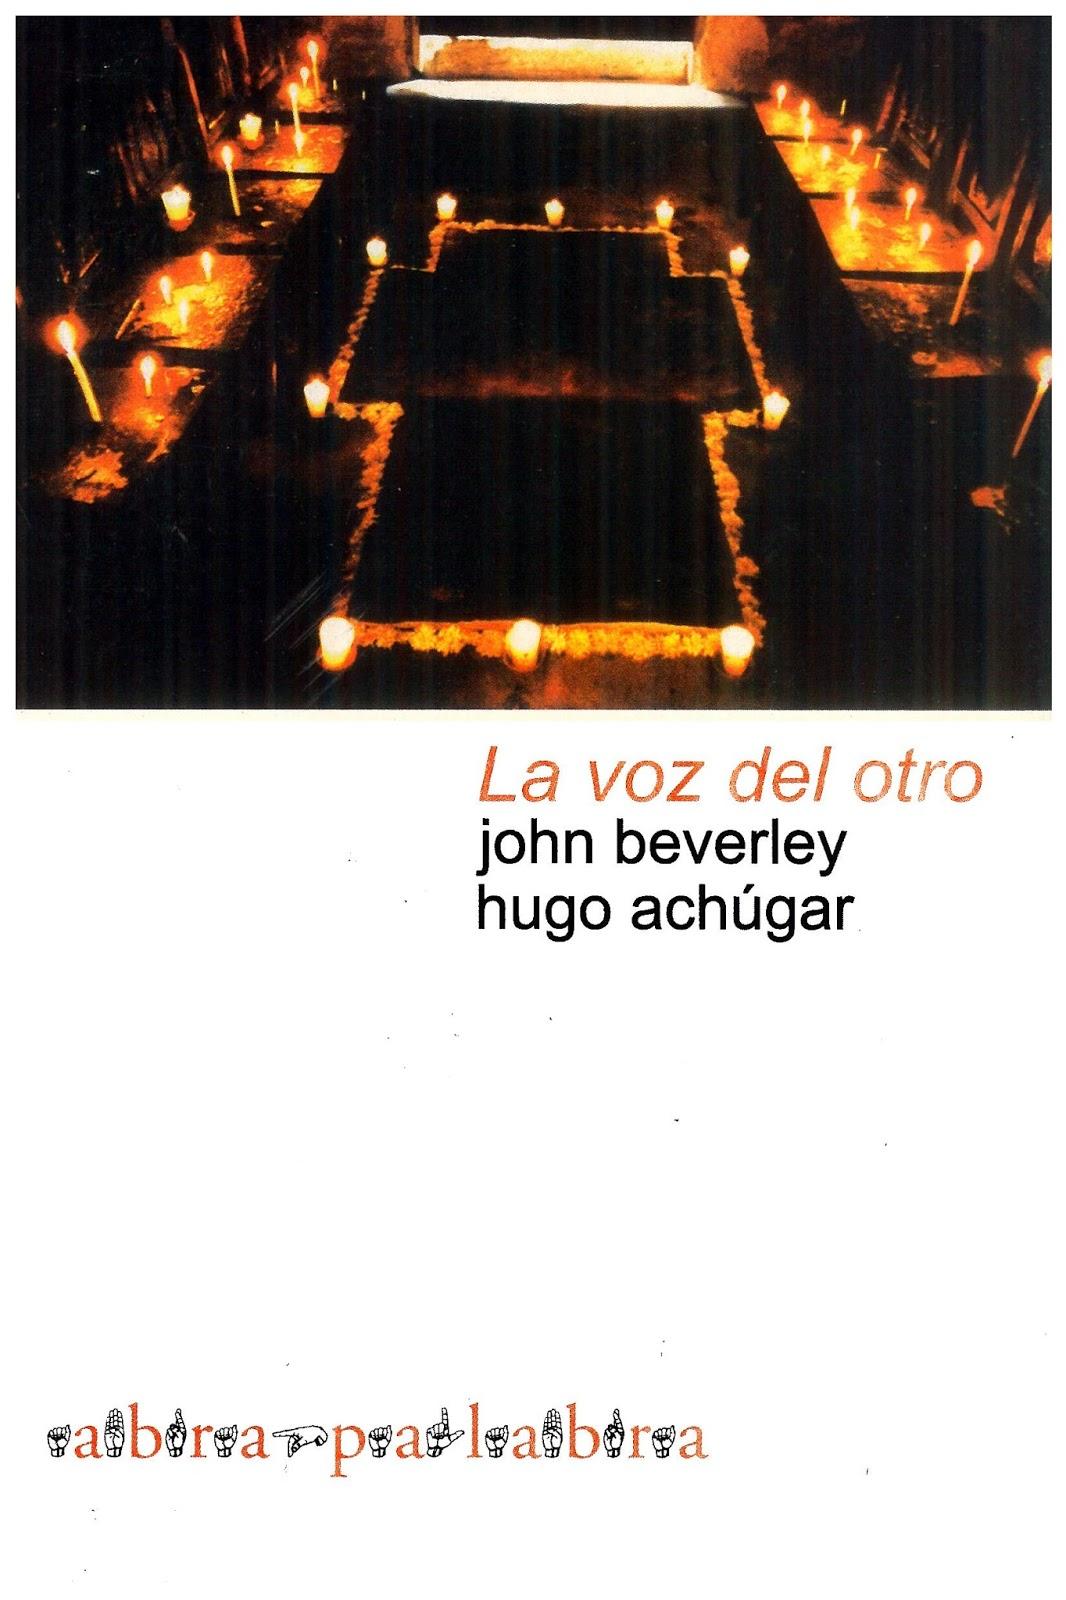 La voz del otro: Testimonio, Subalternidad y verdad narrativa – John Beverley